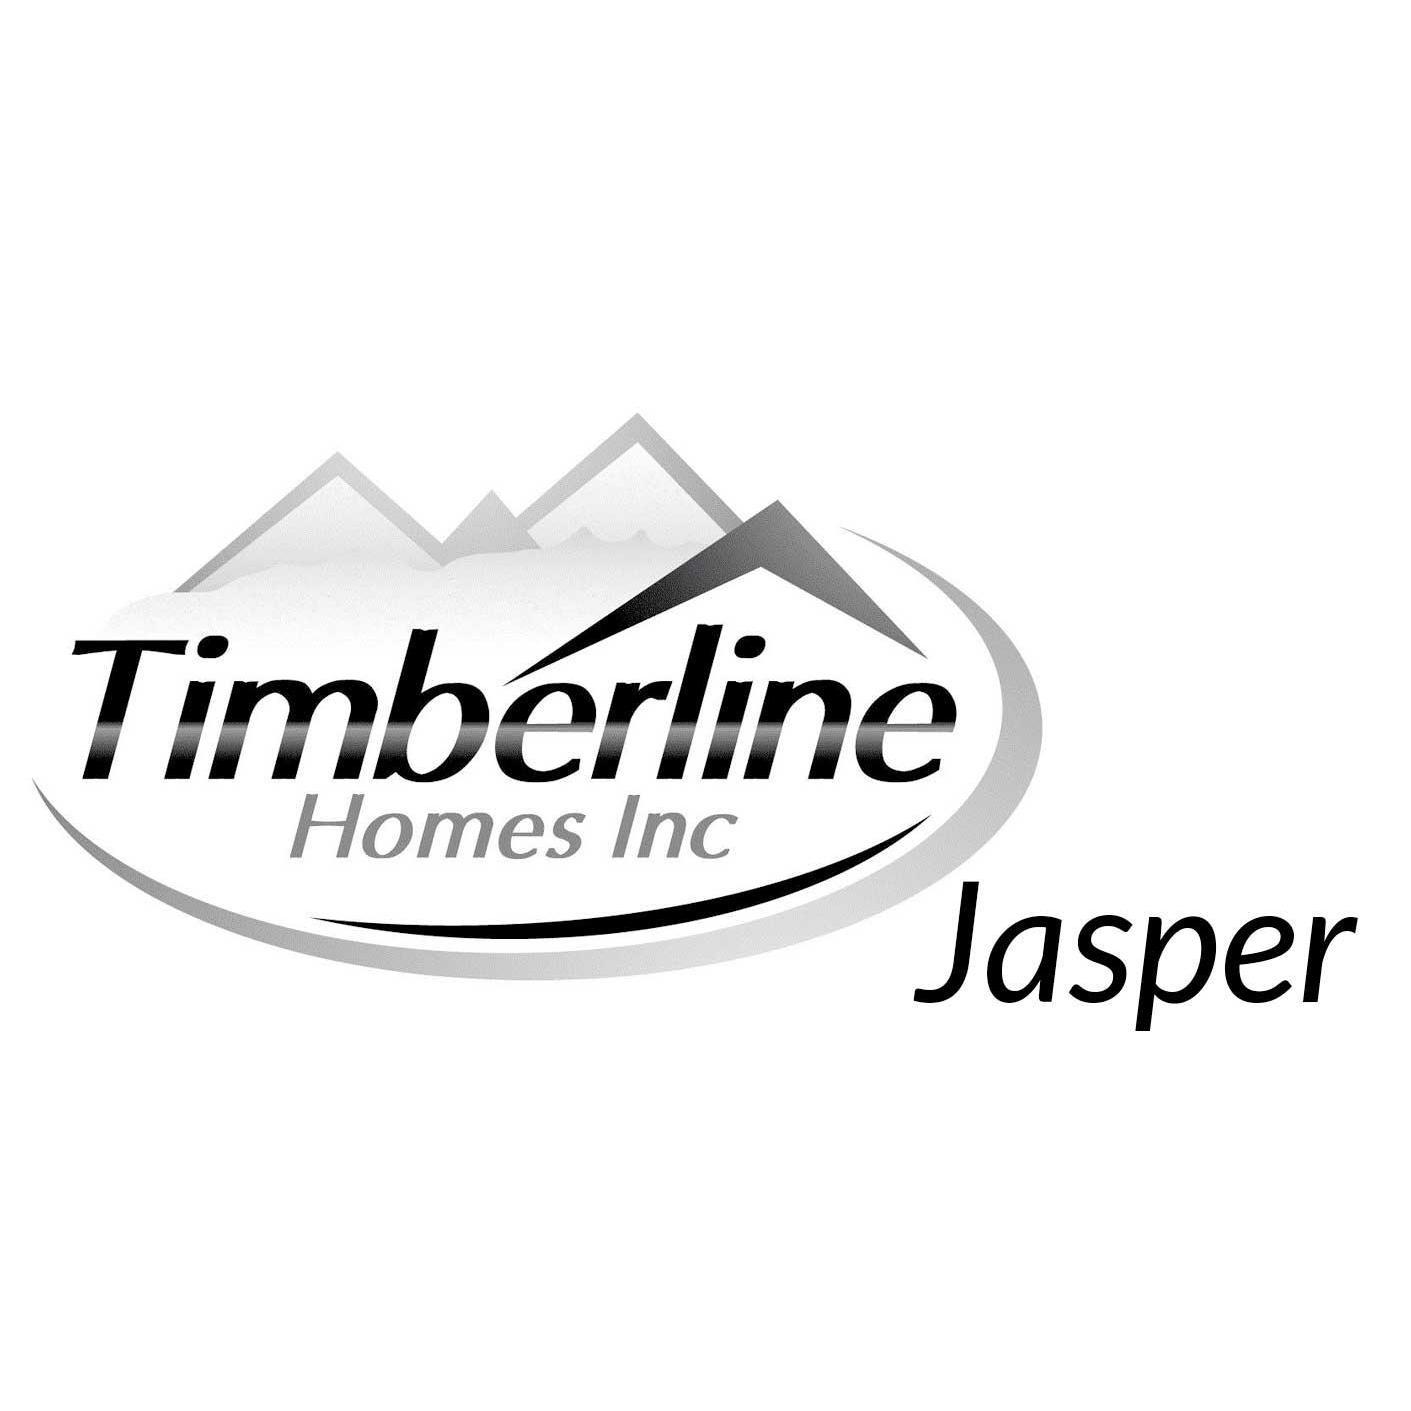 Timberline Homes Inc Jasper